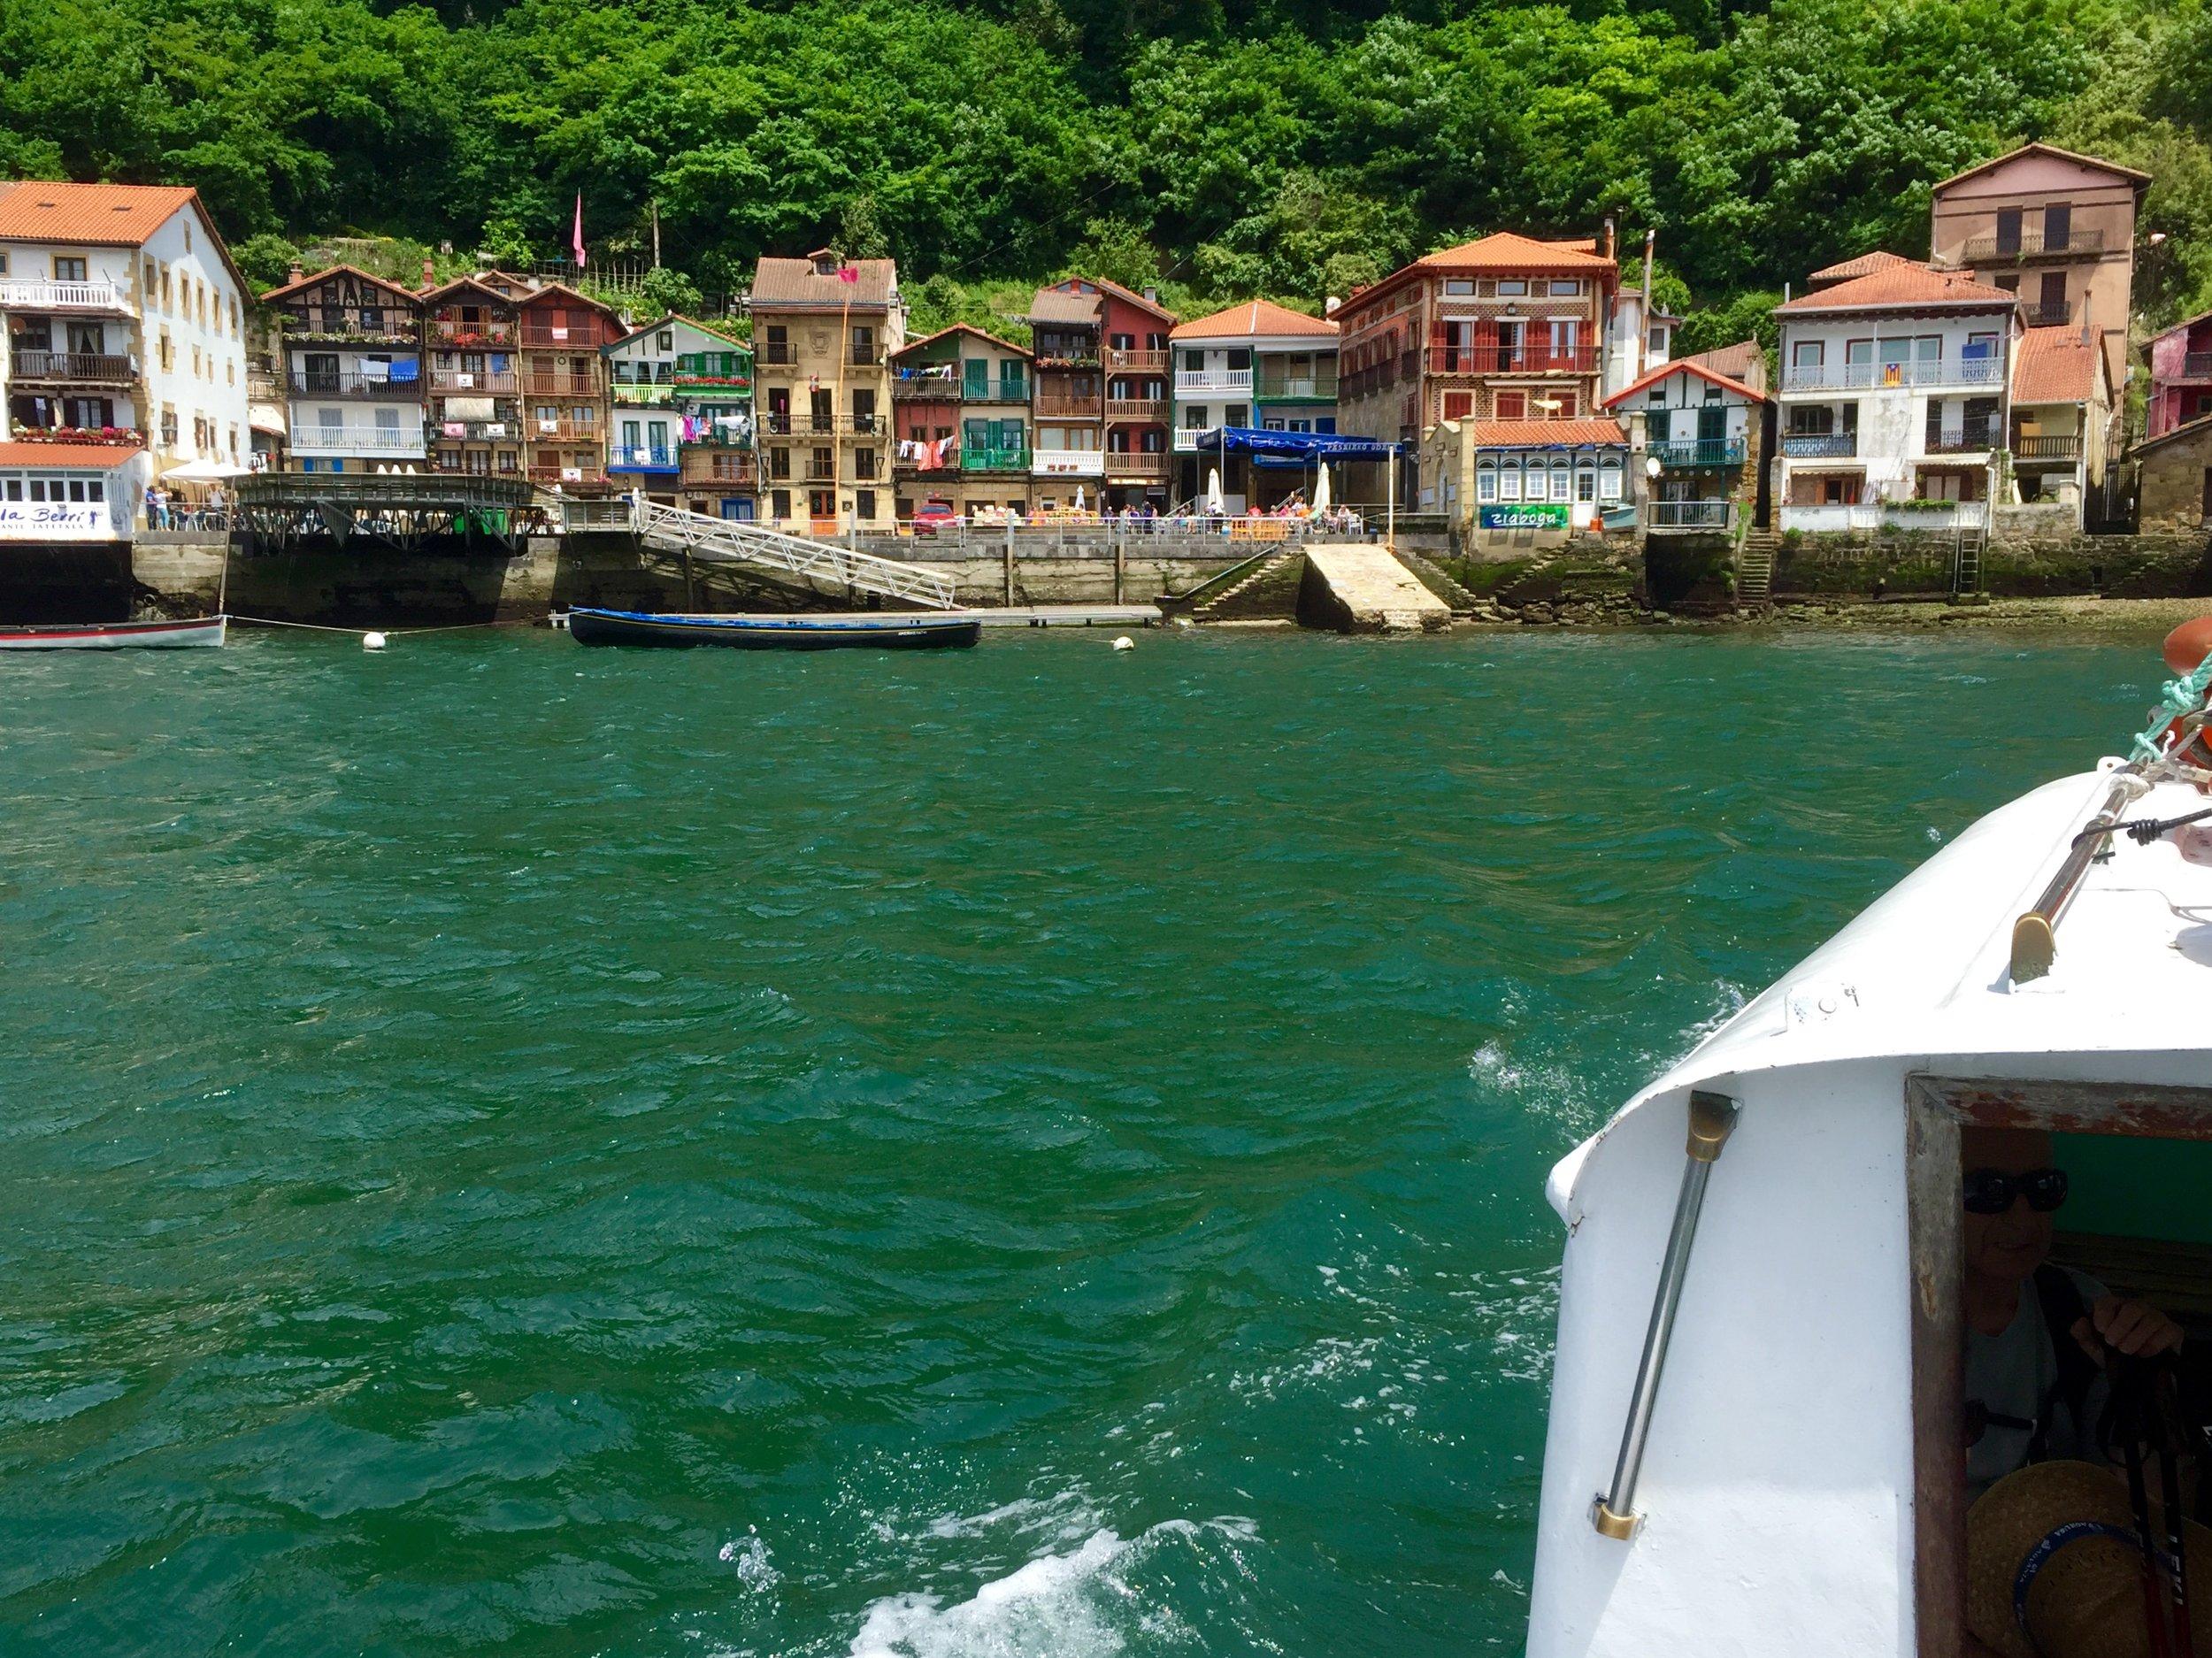 Taking the water taxi across the harbor from San Sebastian to Restaurante Ziaboga in Pasajes de San Juan.